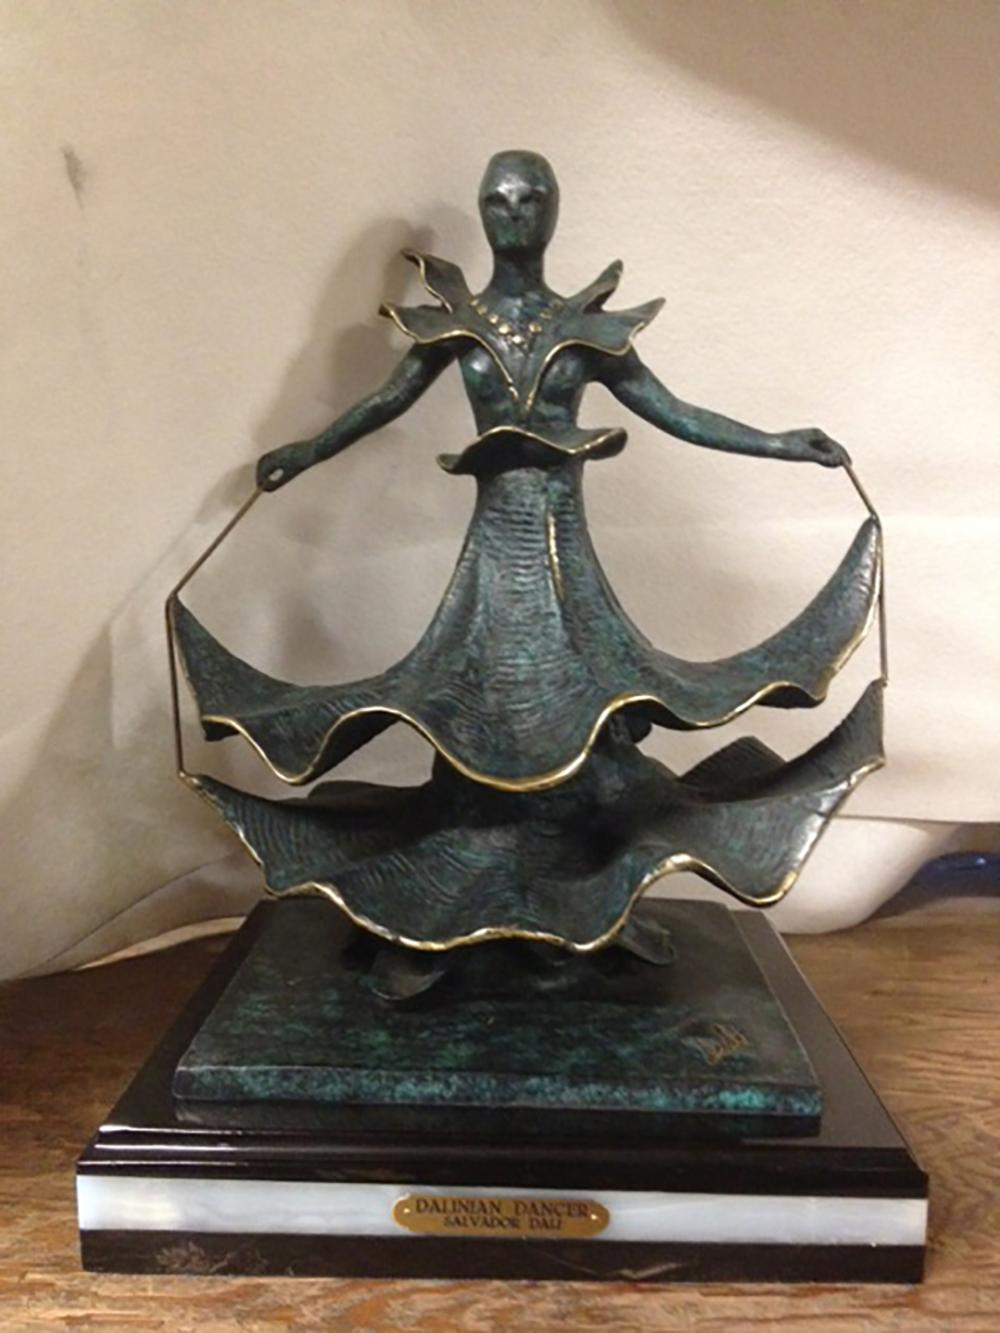 Salvador Dali Dalian Dancer Bronze sculpture